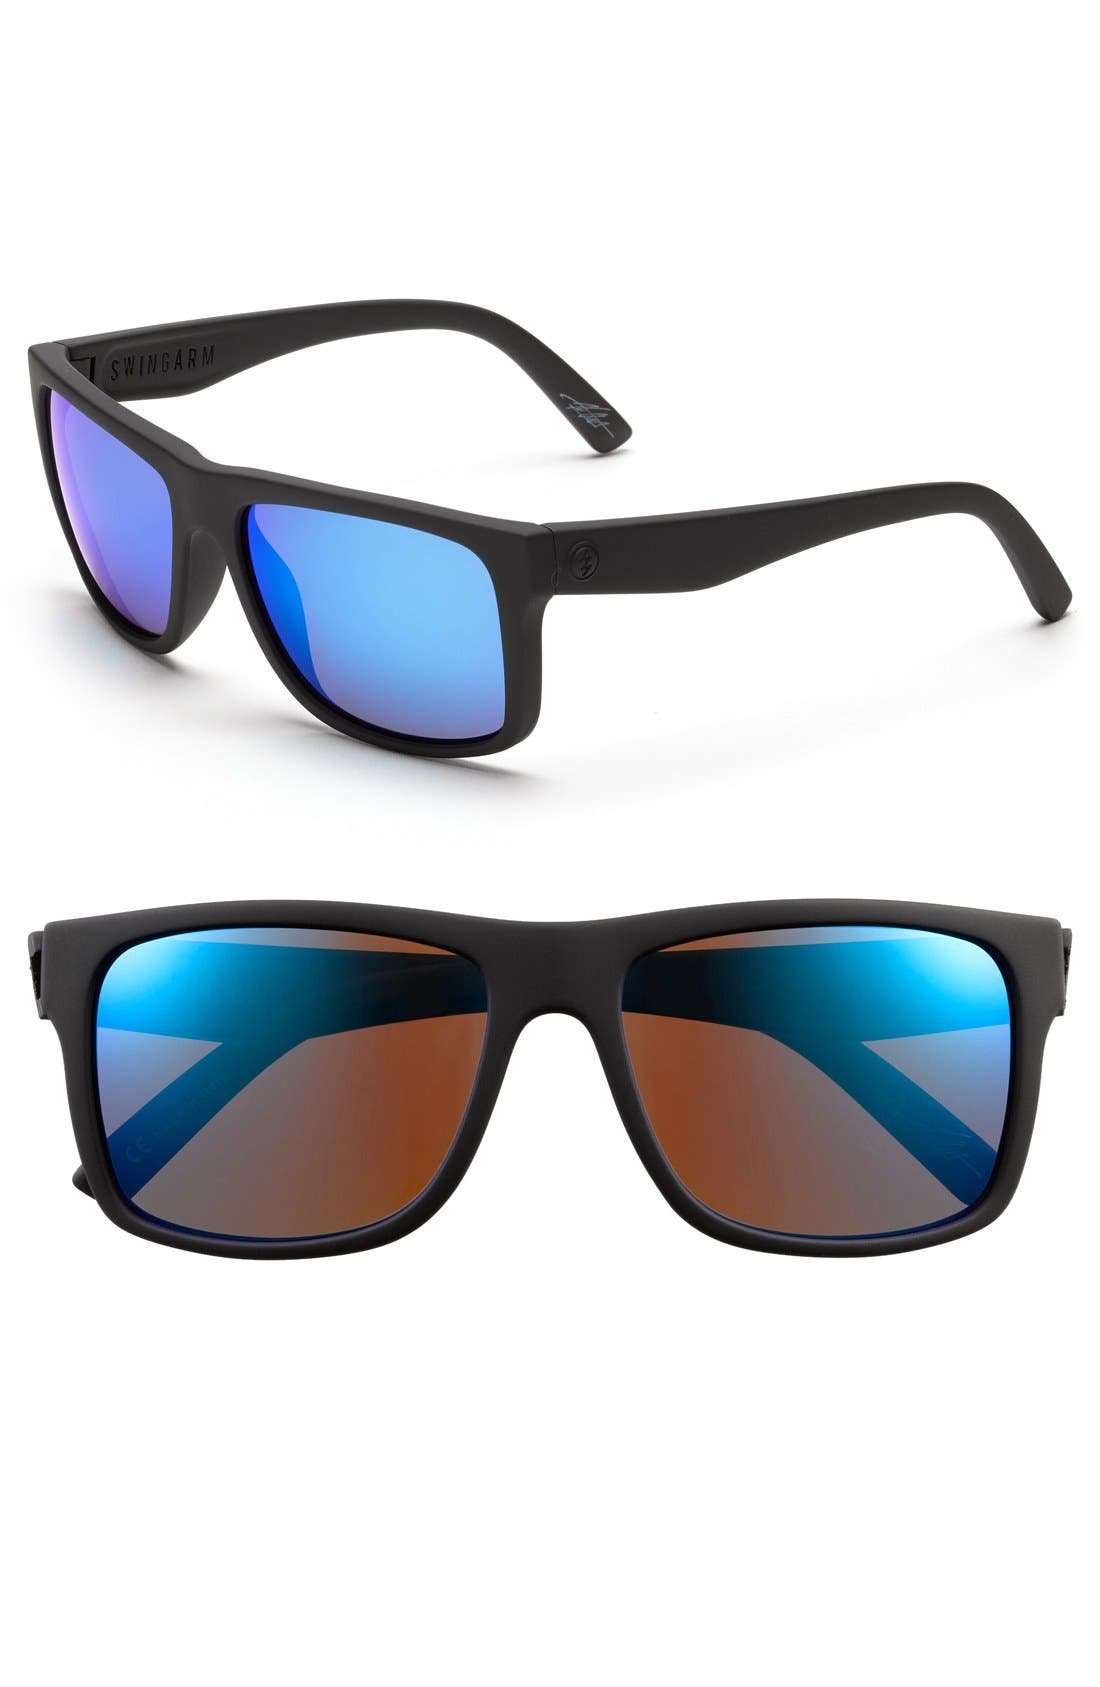 'Swingarm' 57mm Sunglasses,                             Alternate thumbnail 2, color,                             Ohm Grey/ Blue Chrome